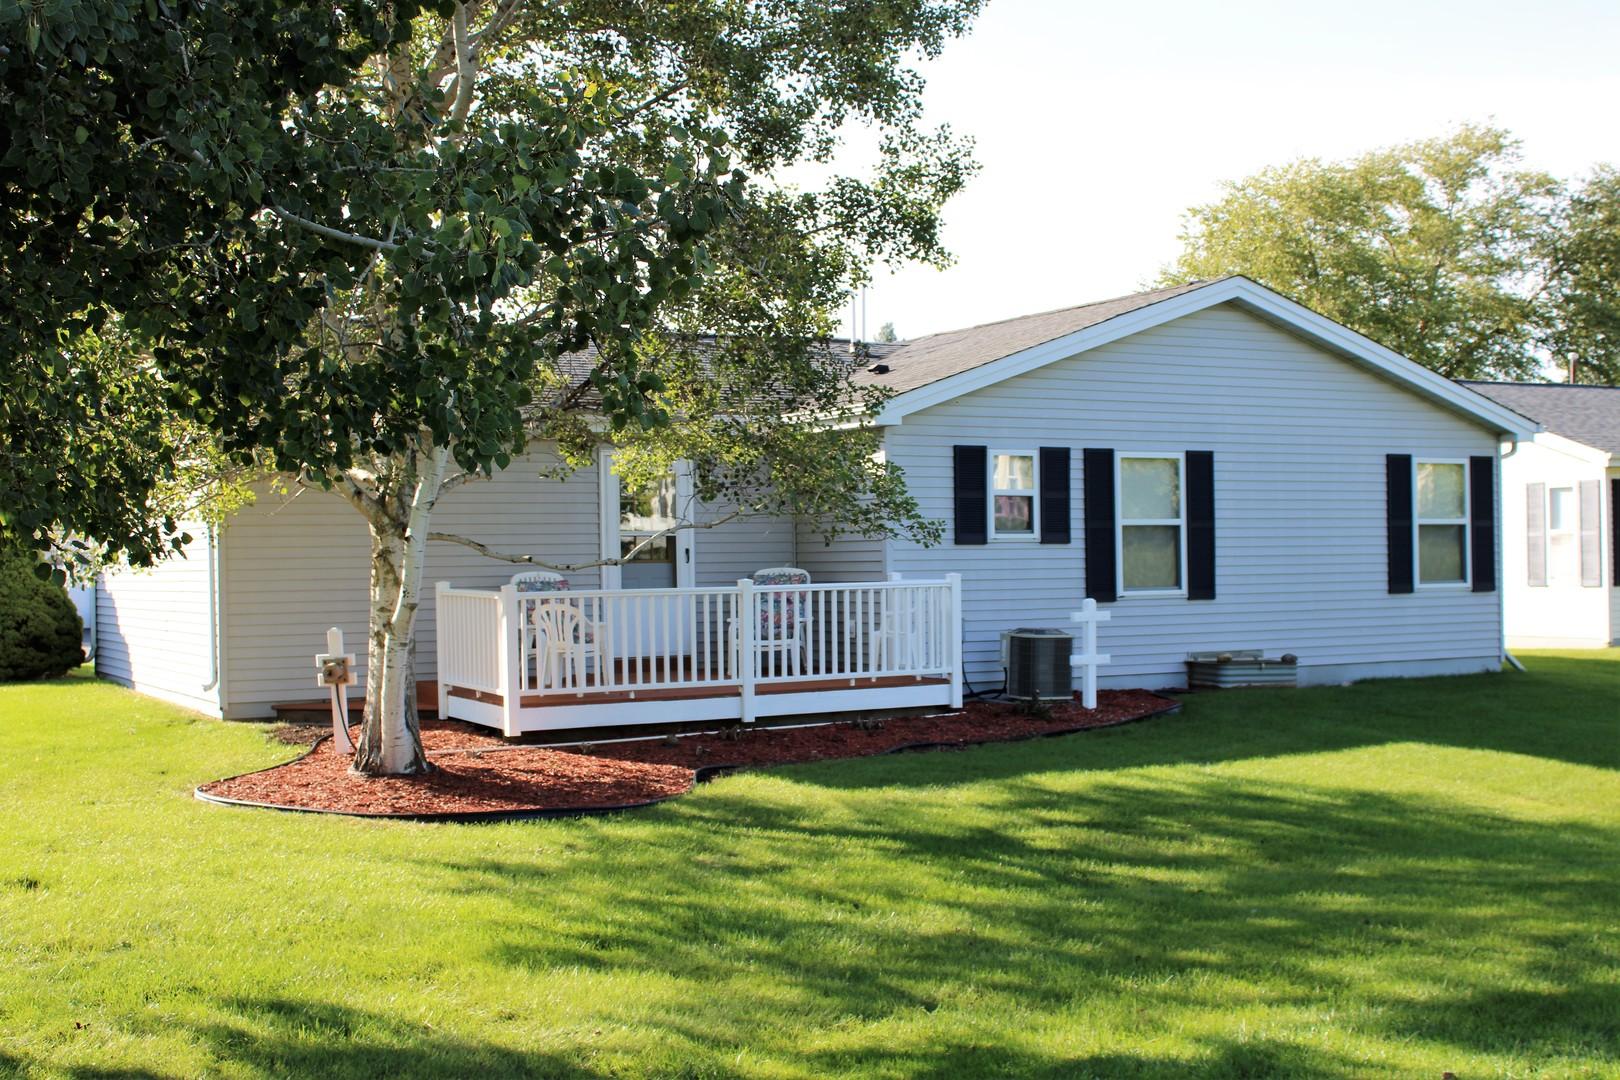 905 Shetland, Grayslake, Illinois, 60030